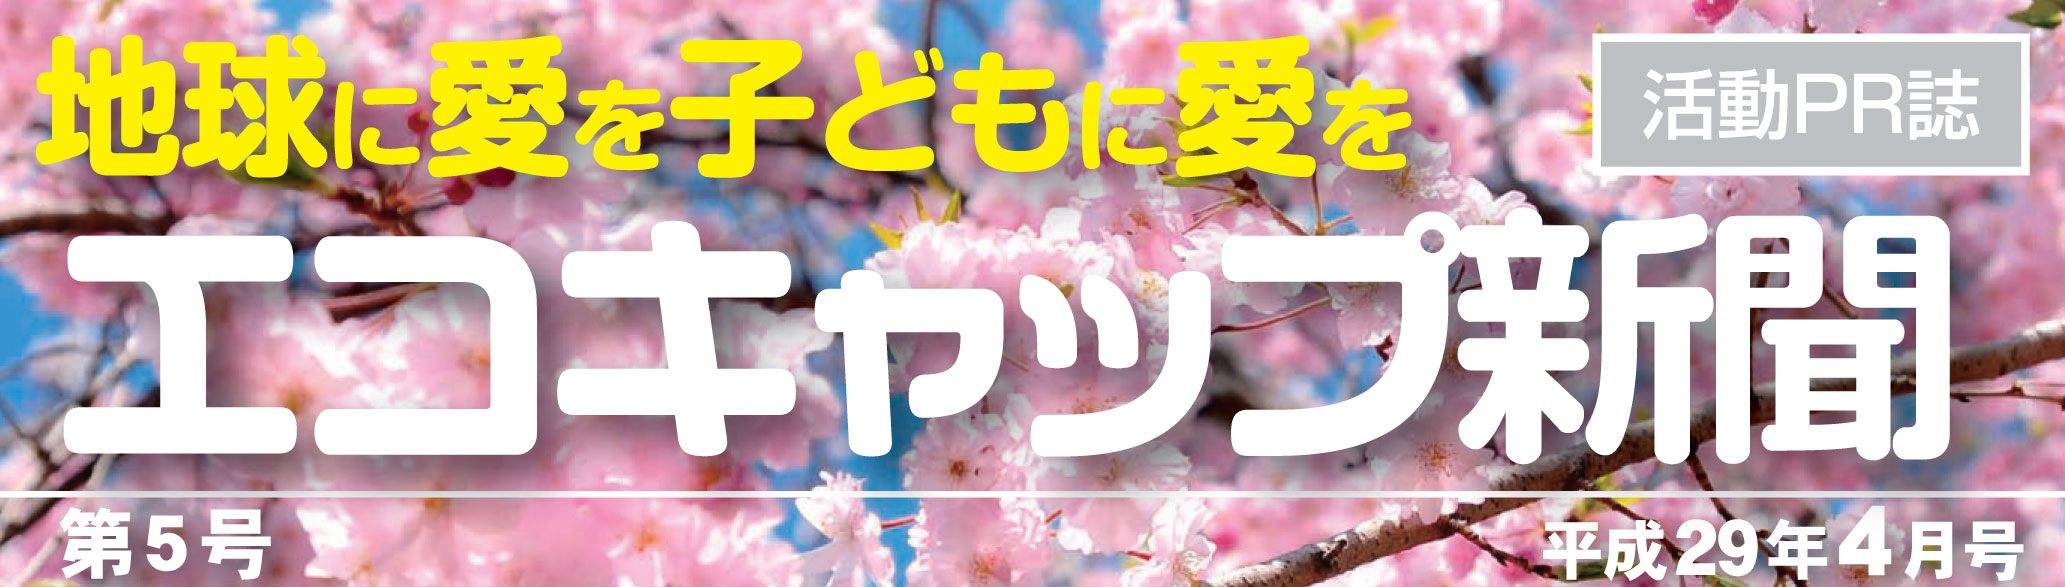 EC新聞05号04月